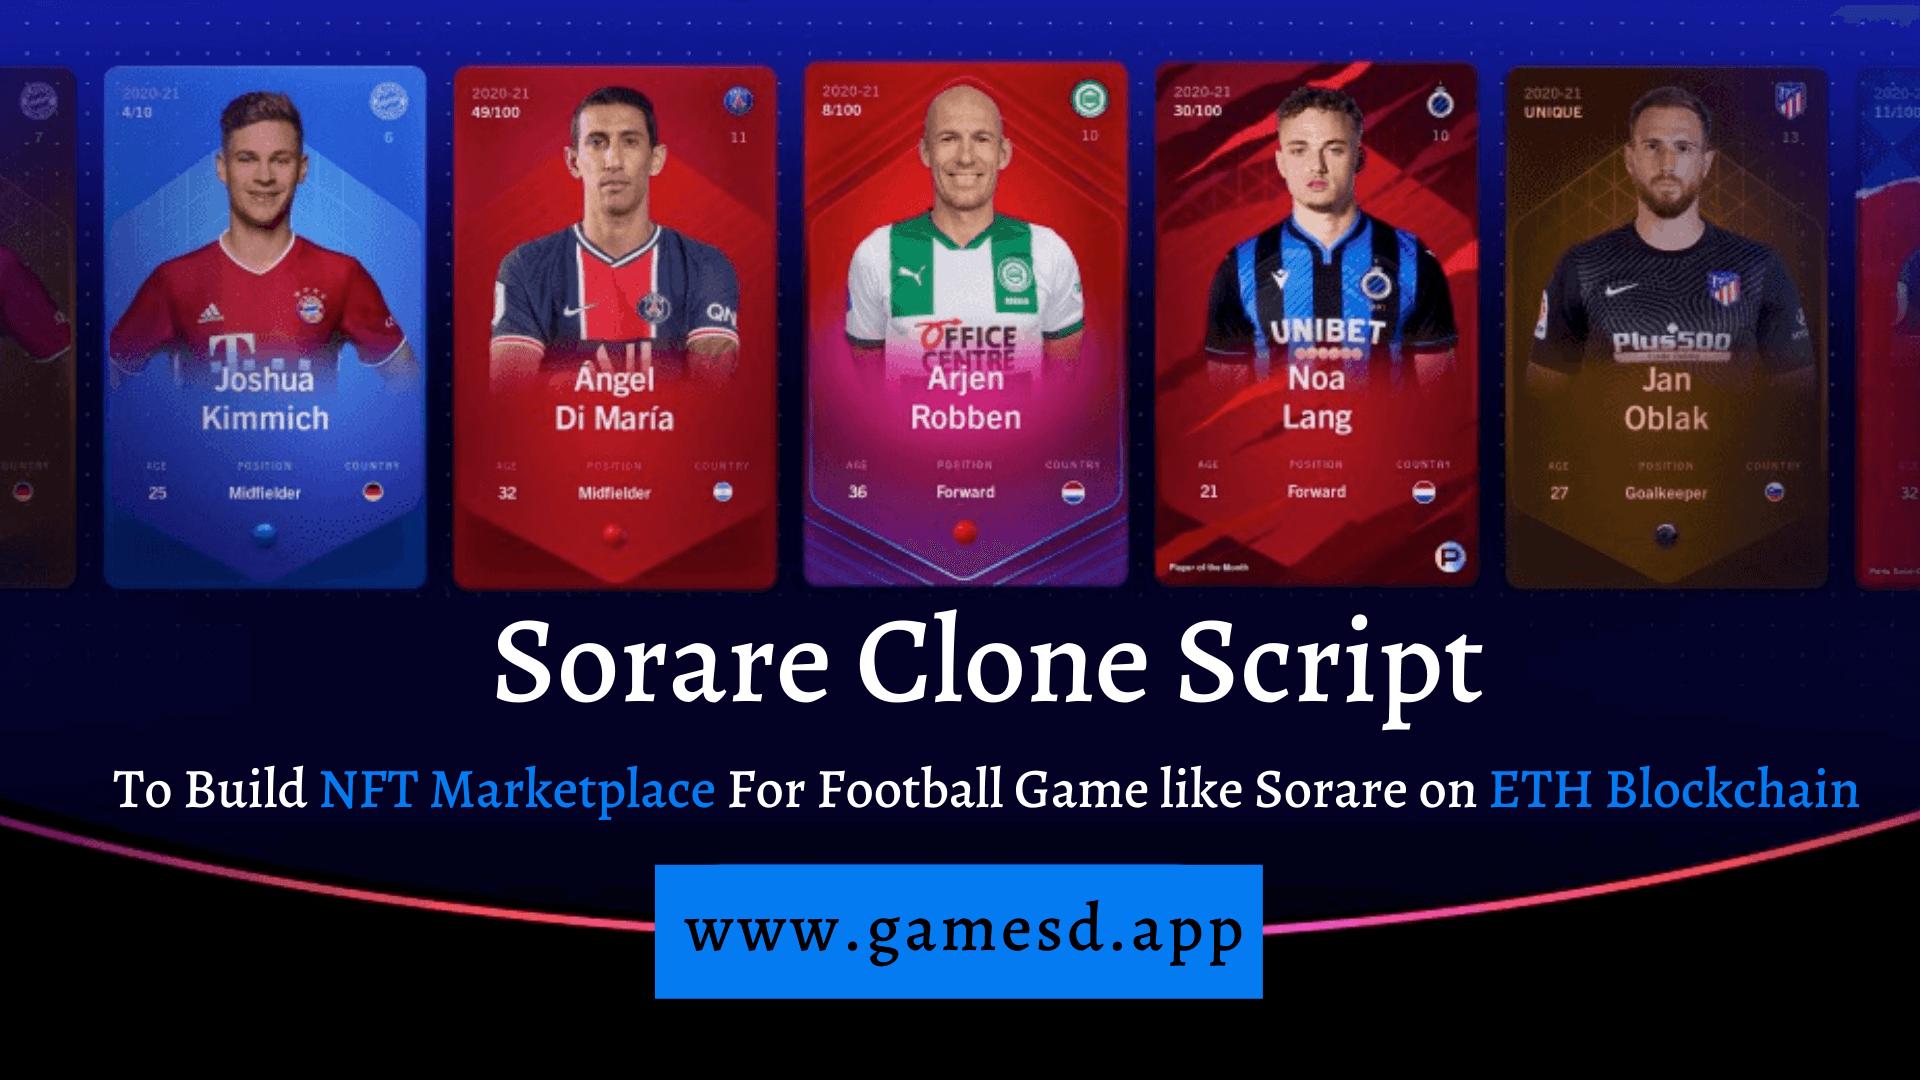 Sorare Clone Script - To Build NFT Marketplace For Football Game like Sorare on ETH Blockchain